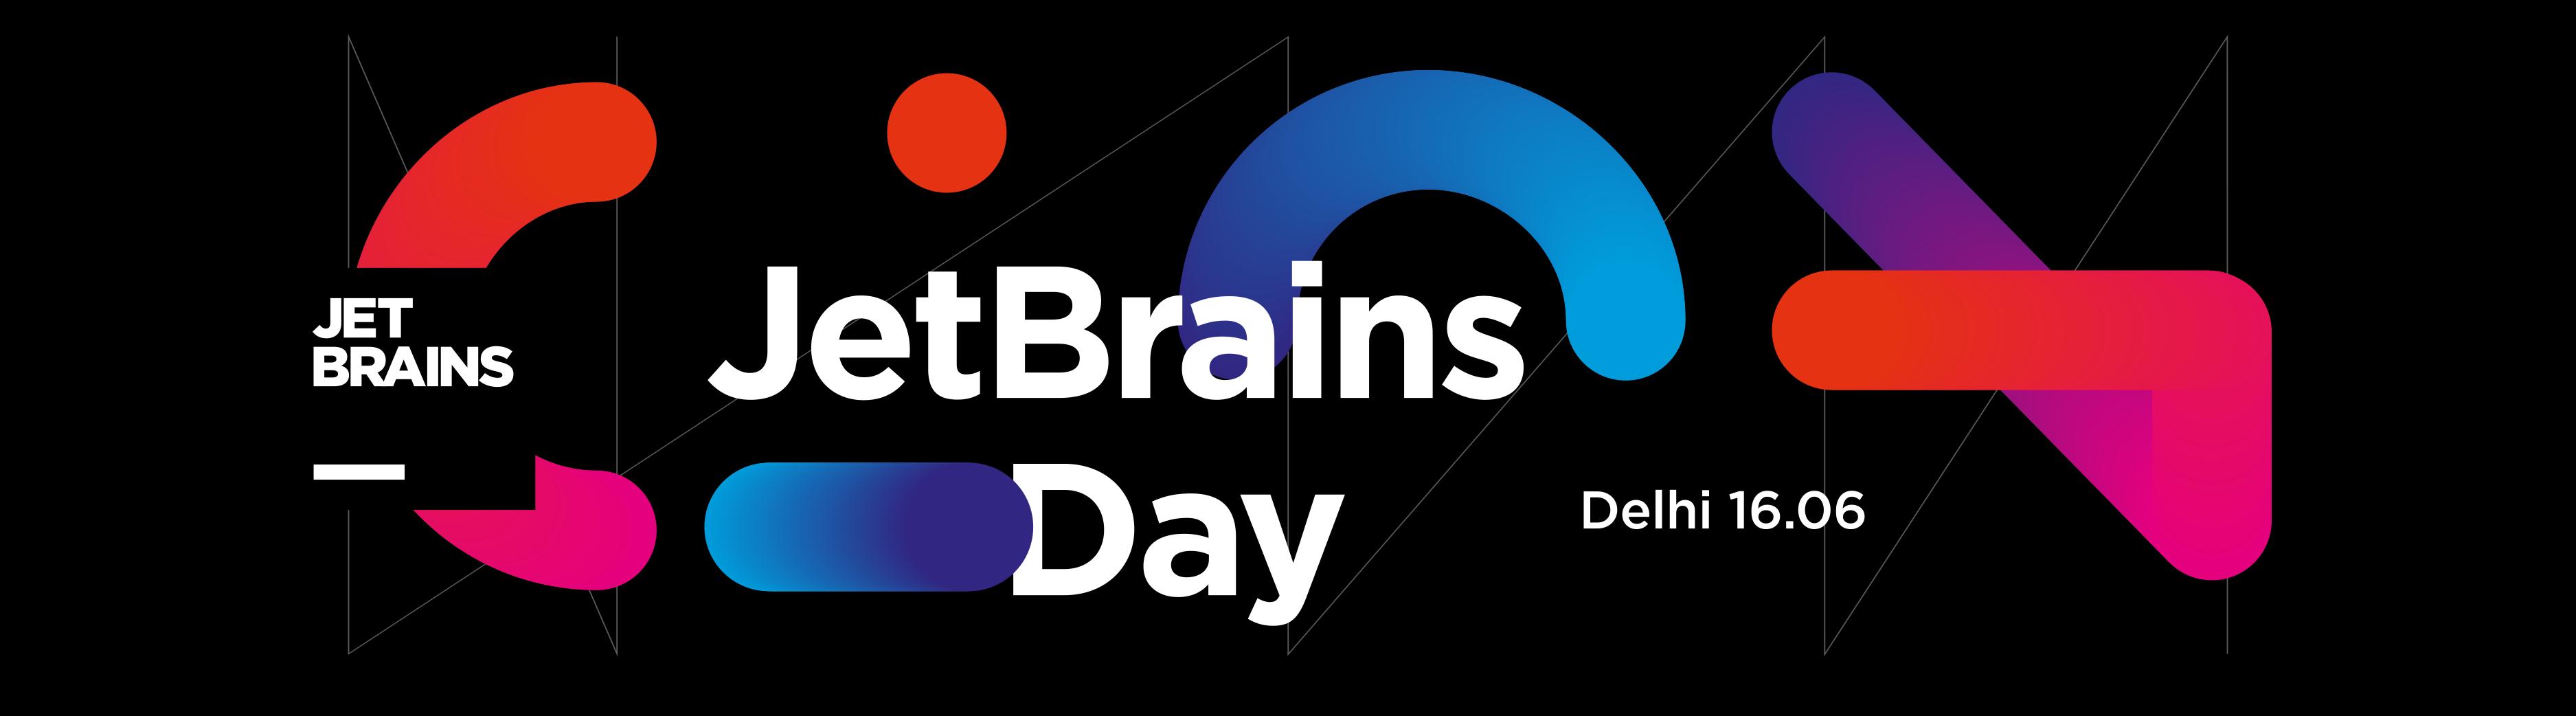 JetBrains Day Delhi 2019